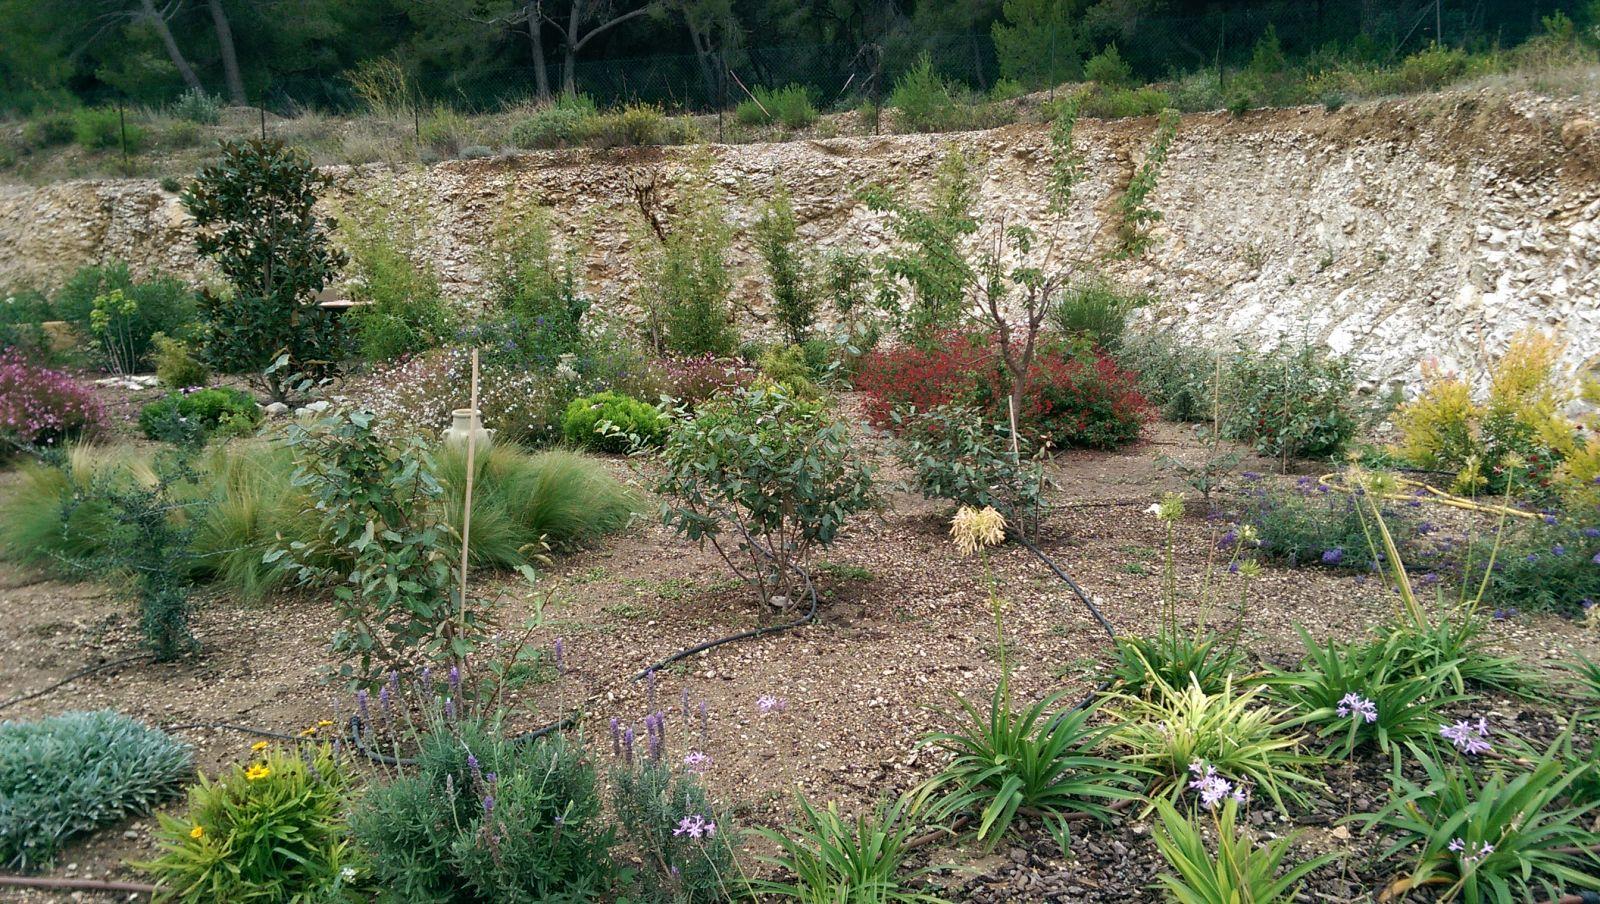 Cr ation d 39 un jardin m diterran en sur la c te bleue for Creation jardin mediterraneen